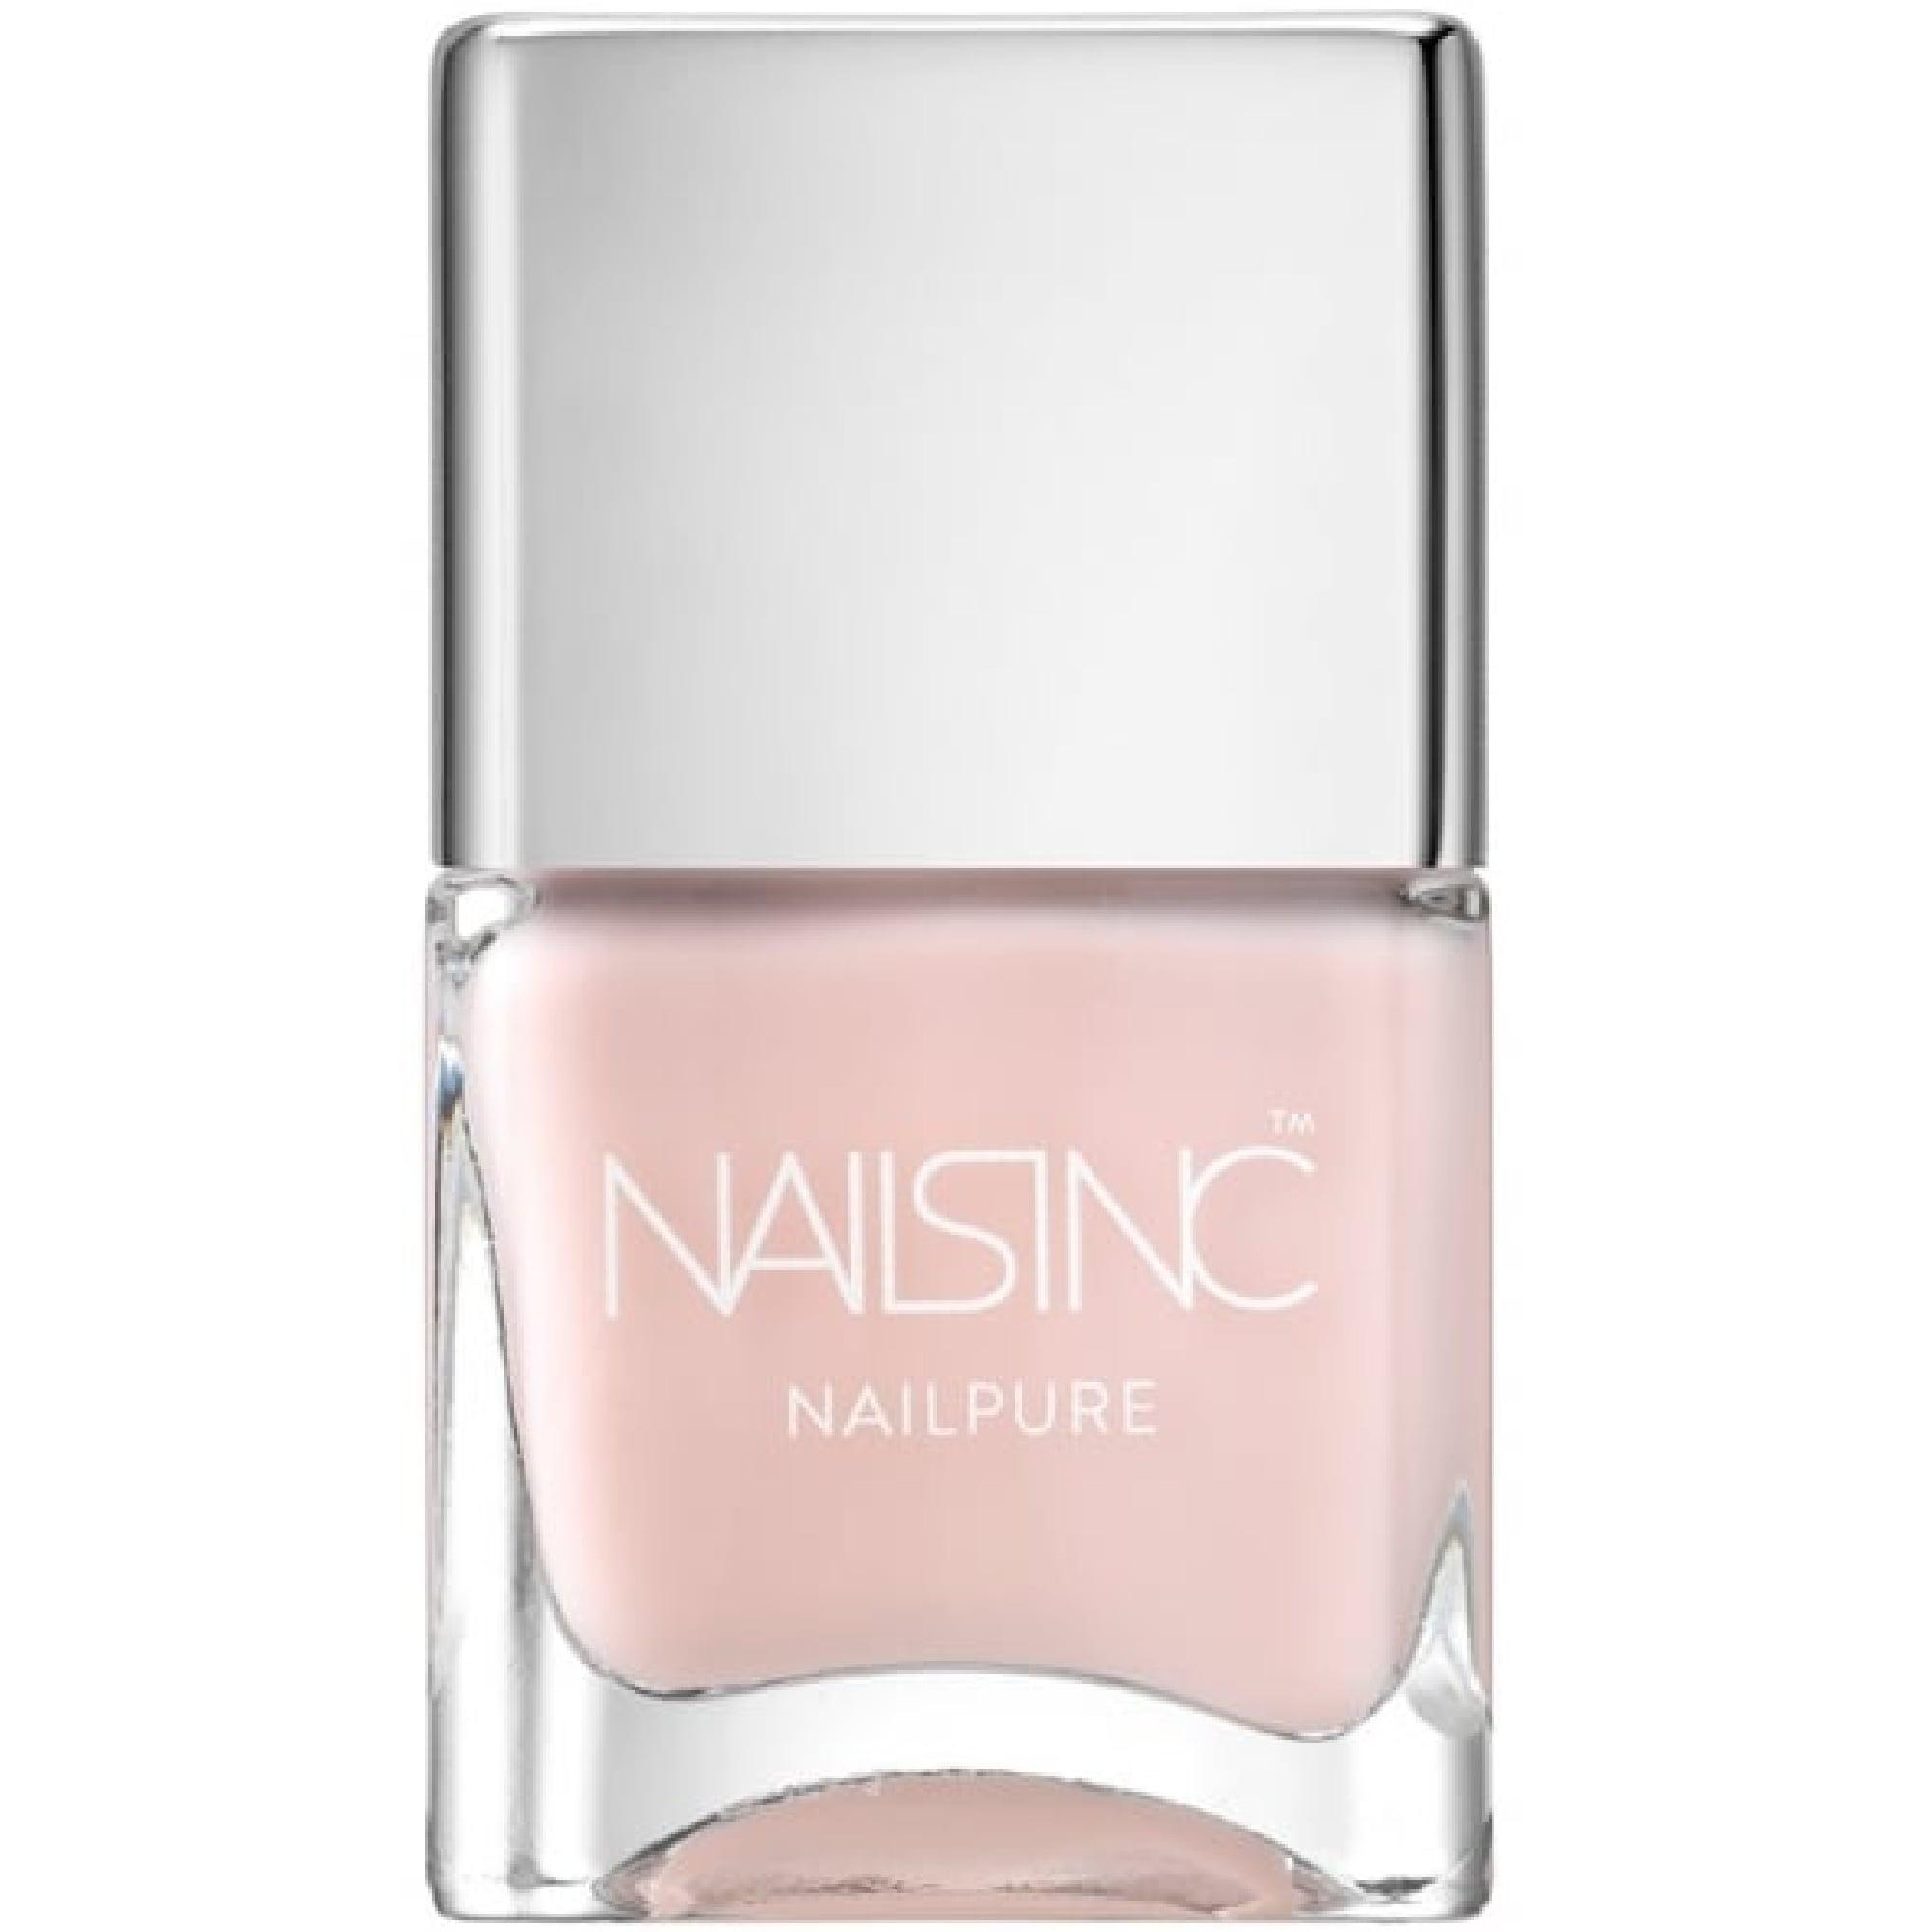 nails-inc-nailpure-nail-polish-london-court-7342-14ml-p21759-88796_zoom